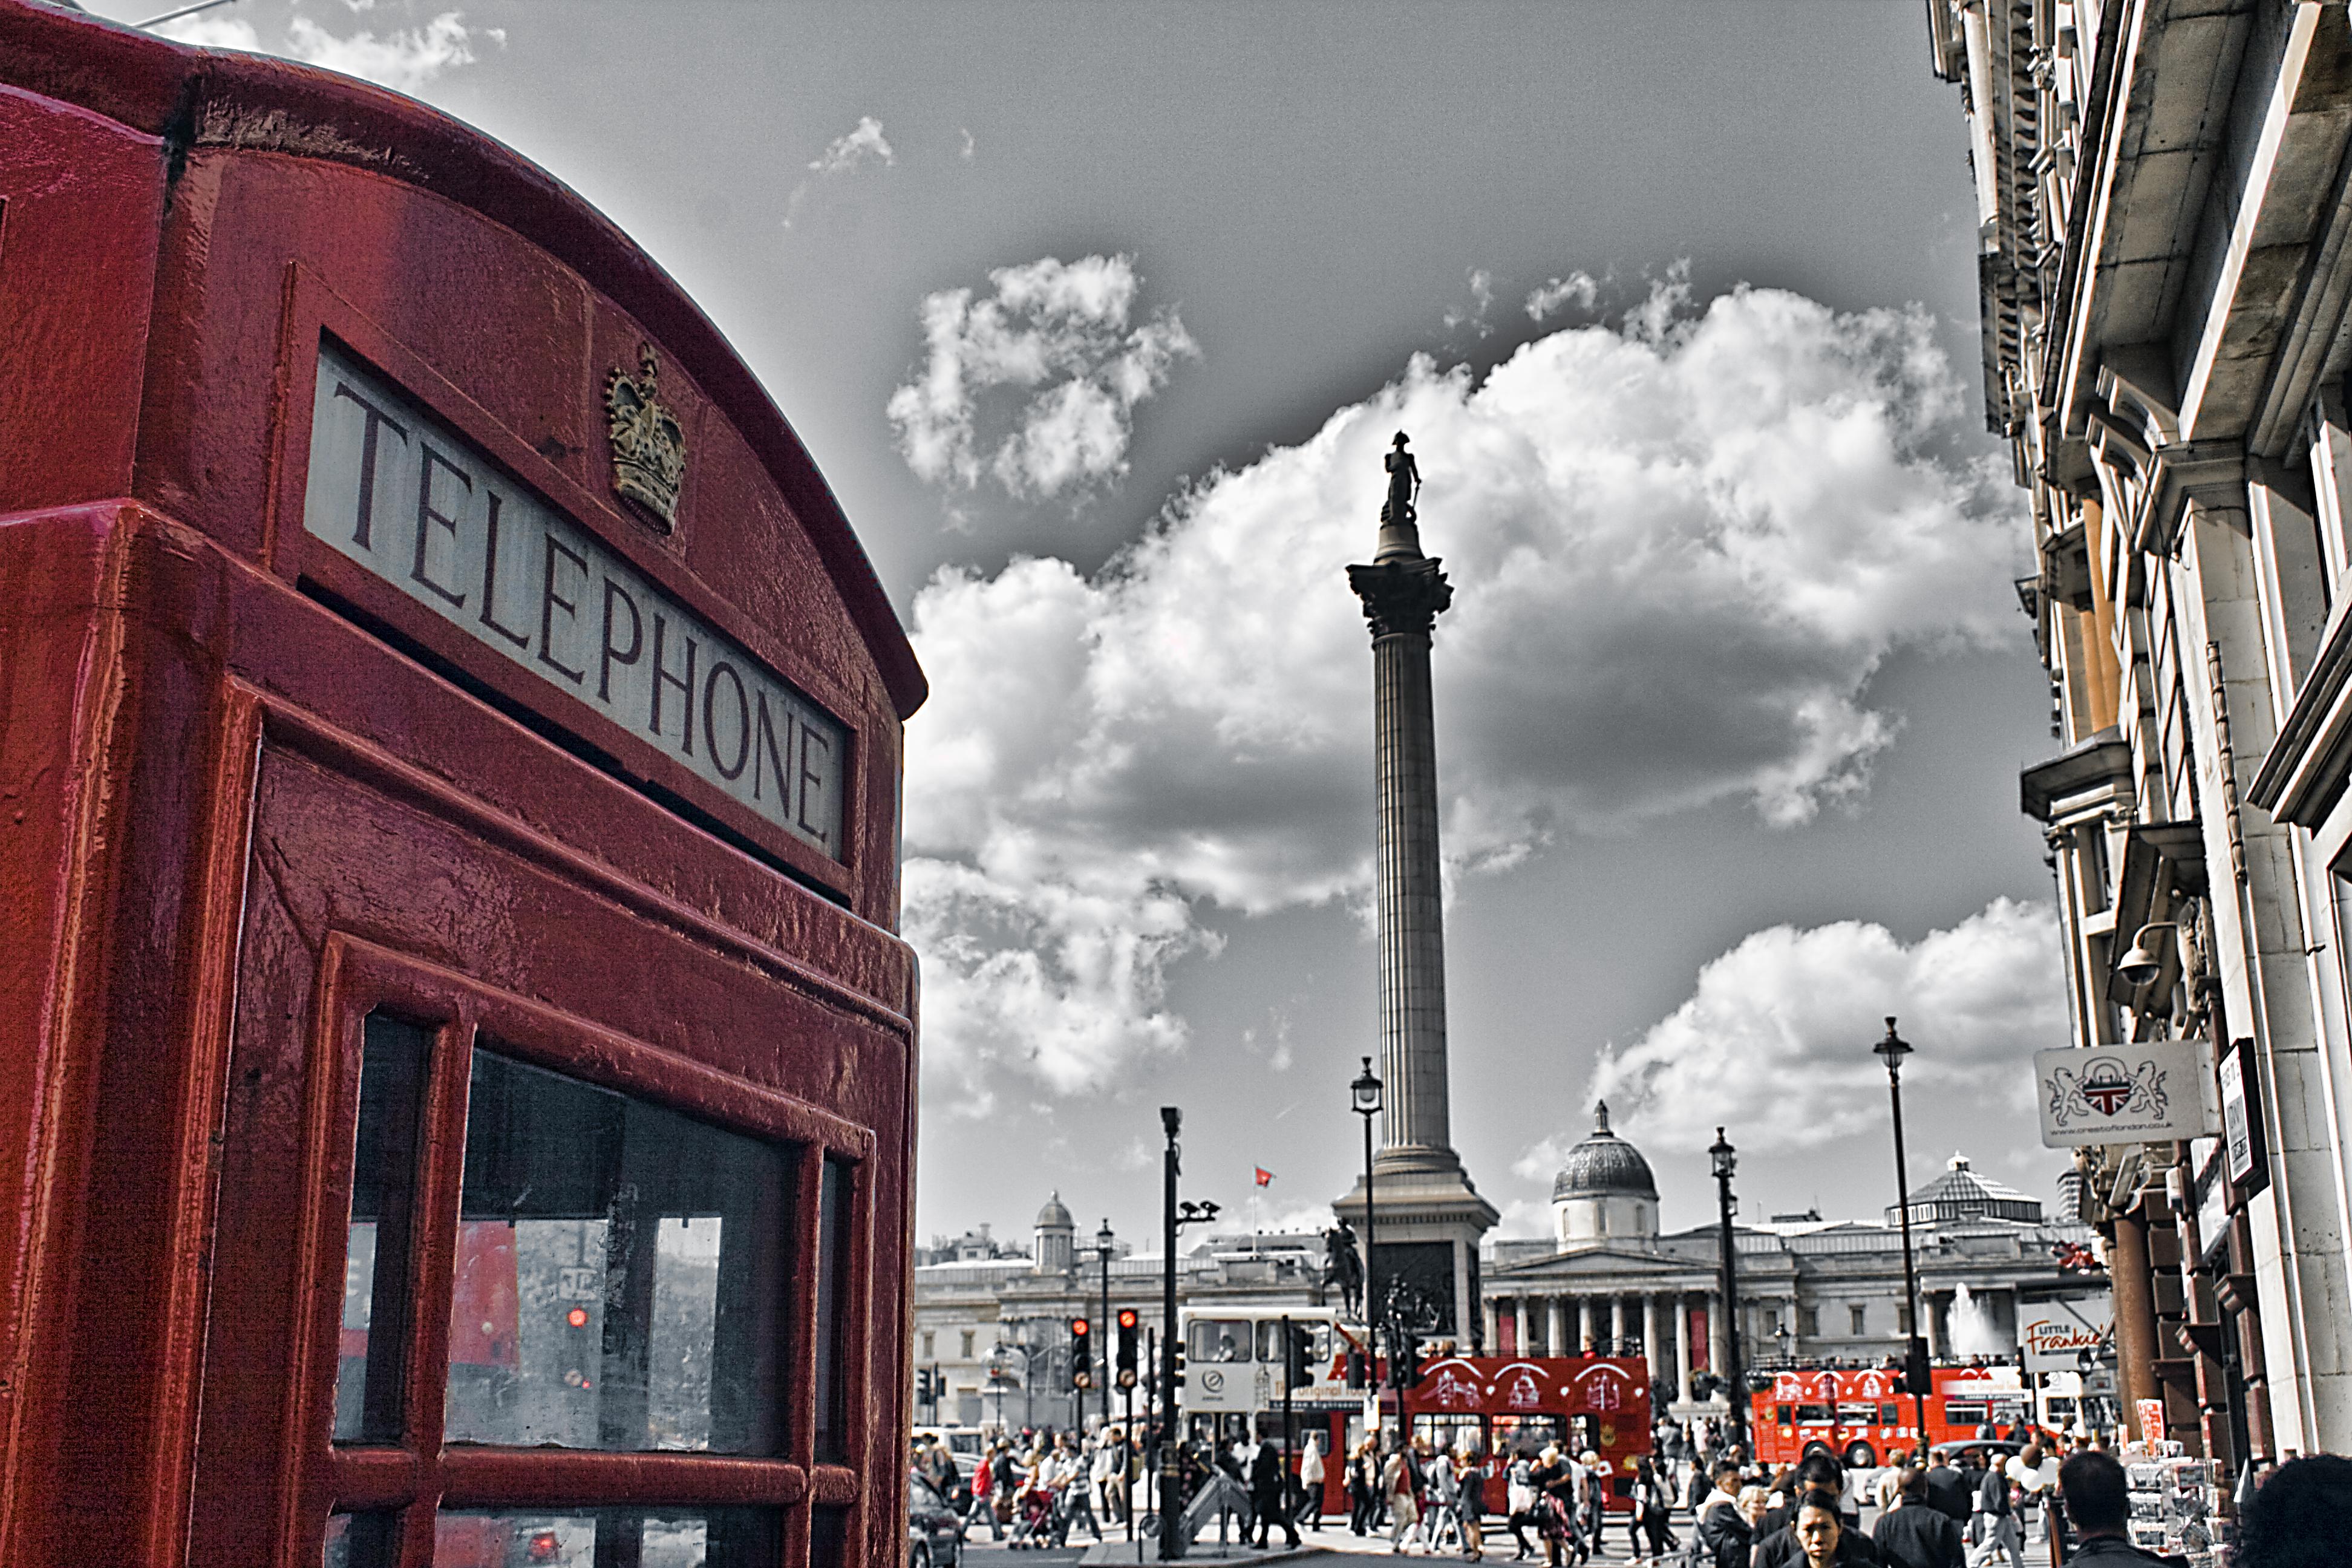 File:London phone booth (4739545684).jpg